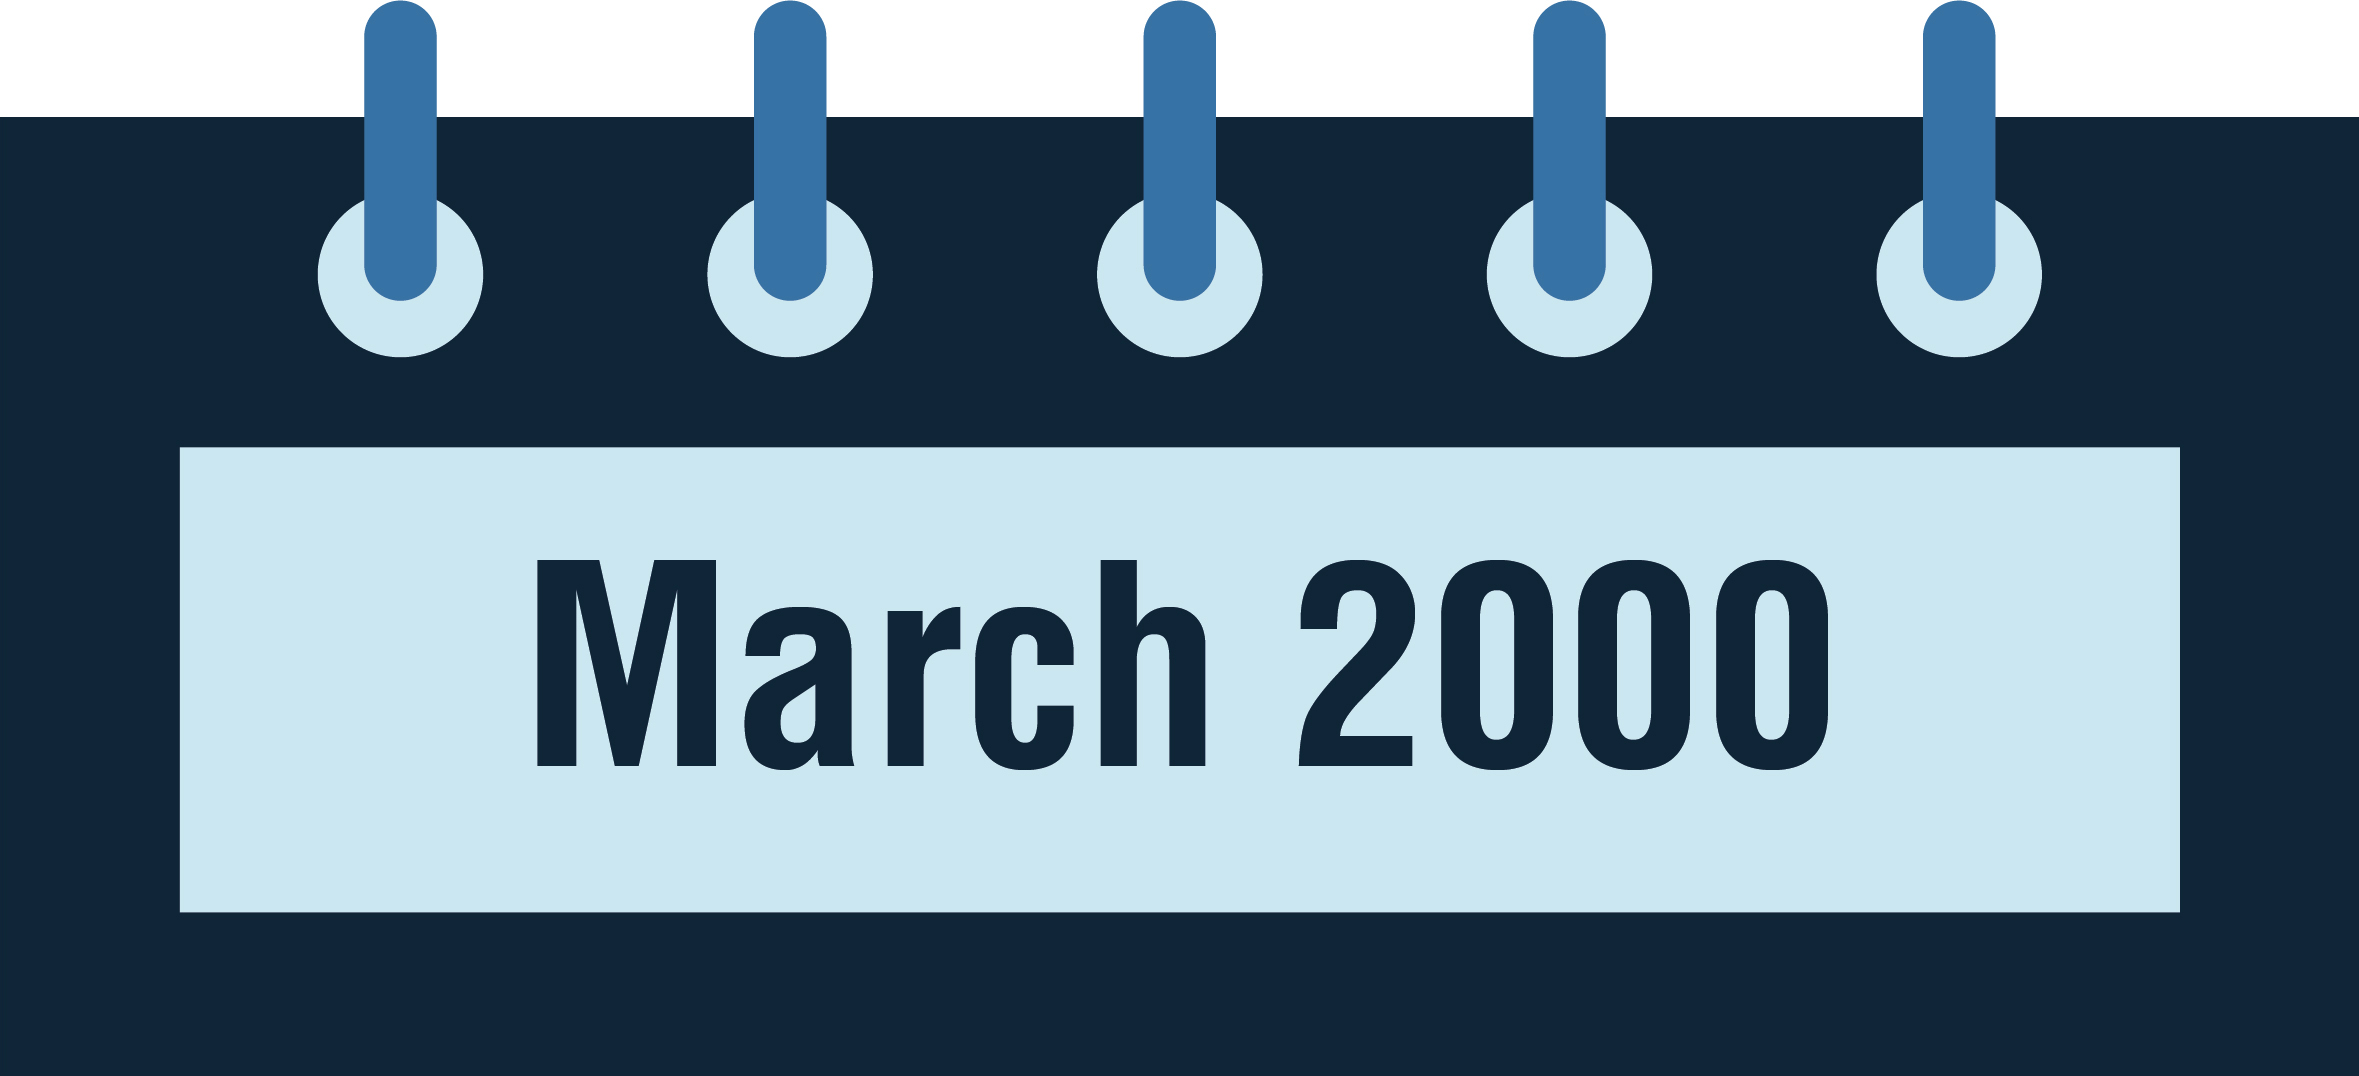 NeuroCheck History - March 2000 (Image © NeuroCheck)